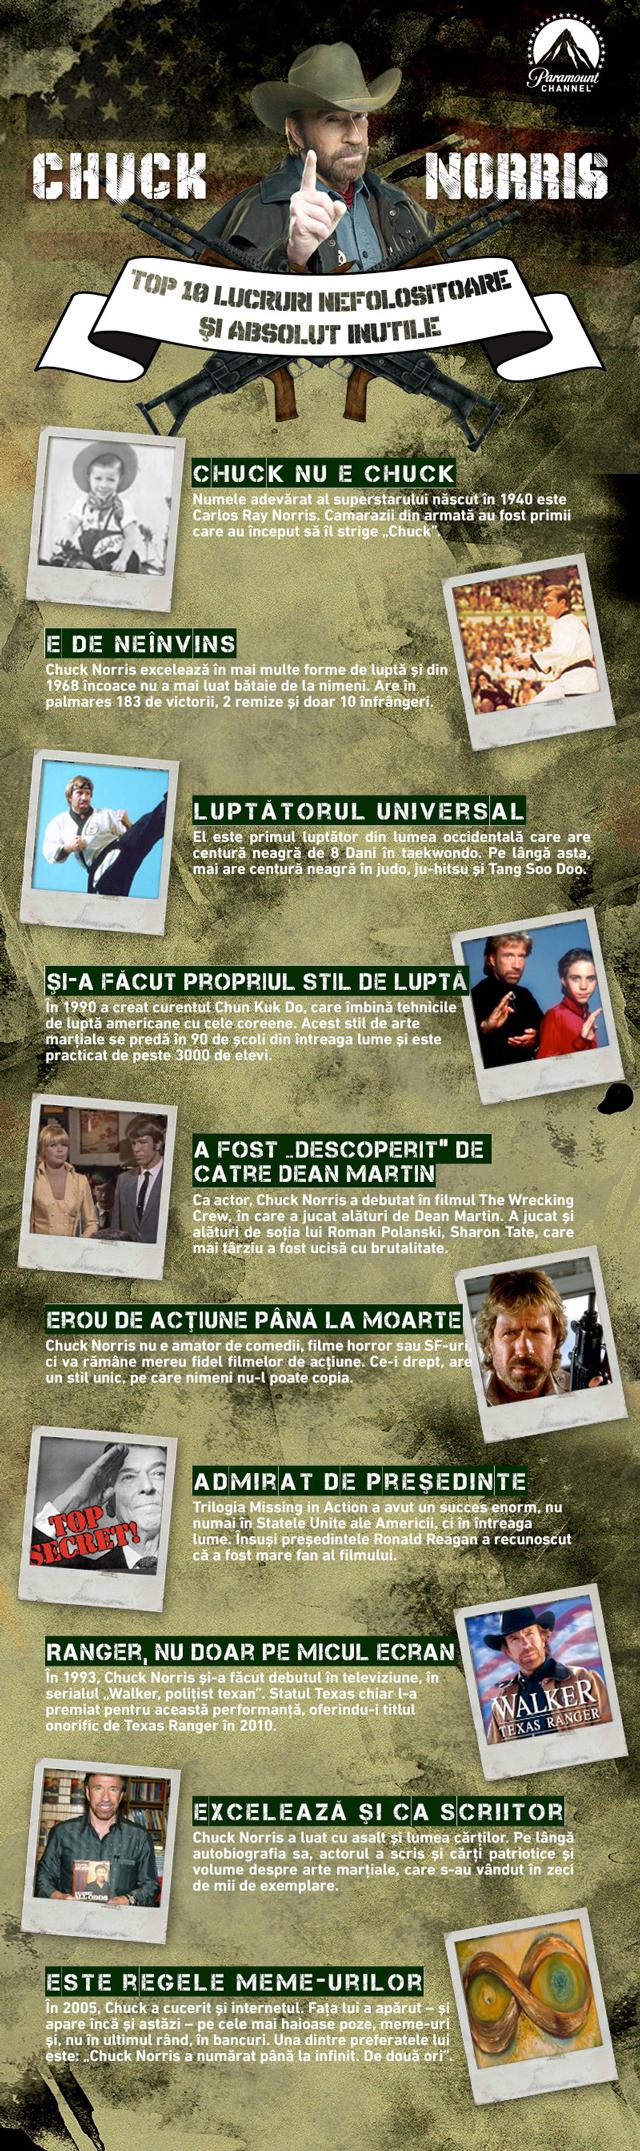 Chuck_Norris_Infographic